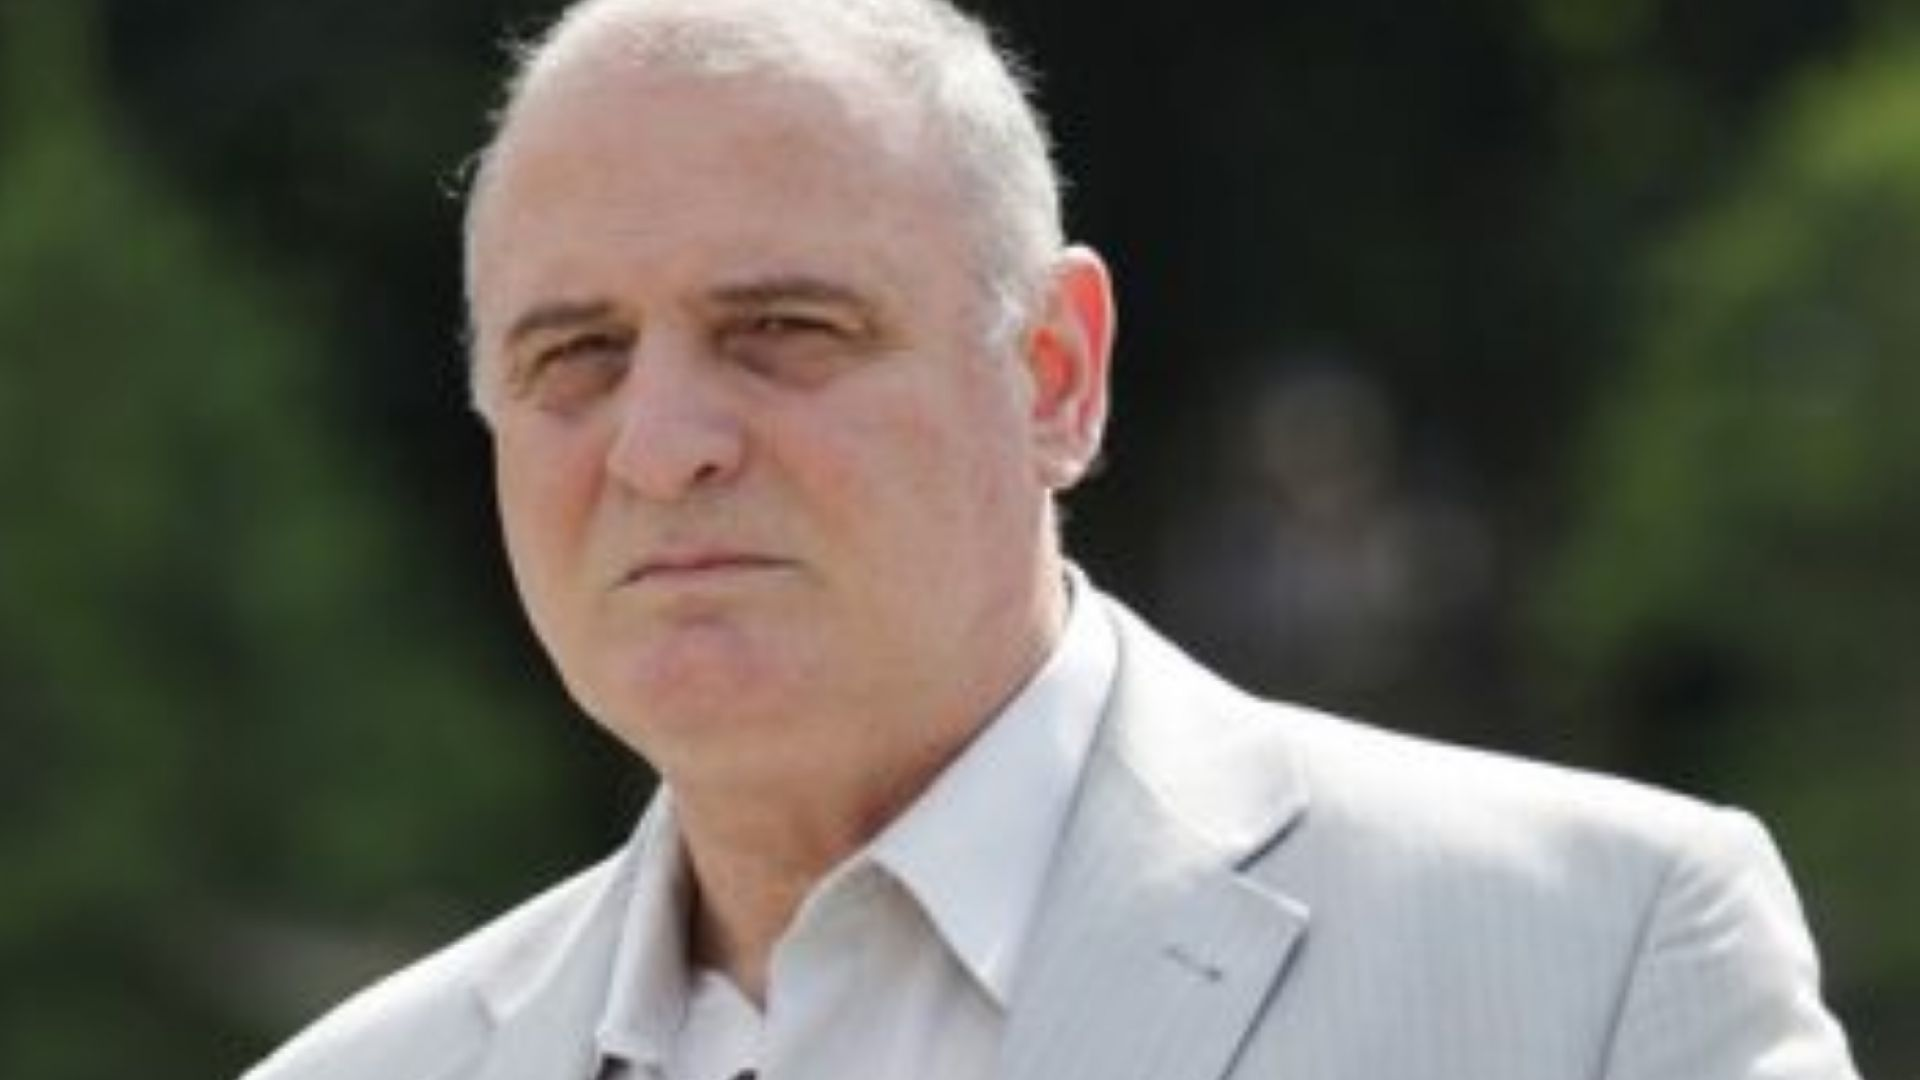 Проф. Радулов: Митьо Очите от български затвор не се бои